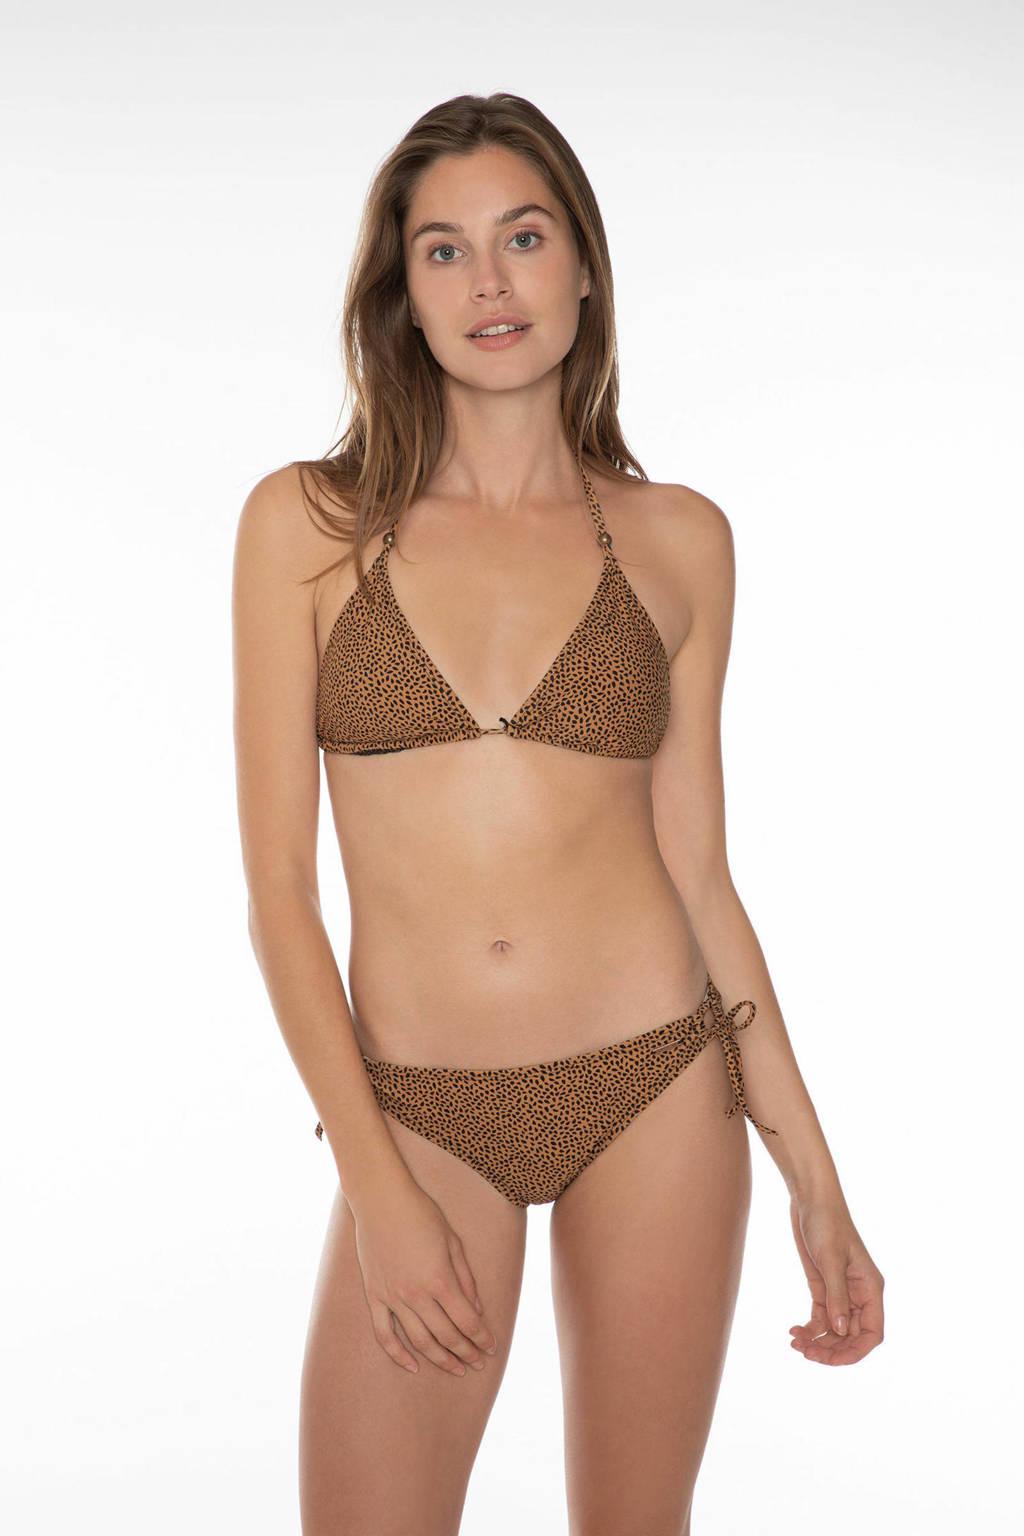 Protest triangel bikini Eva met all over print lichtbruin/zwart, True black